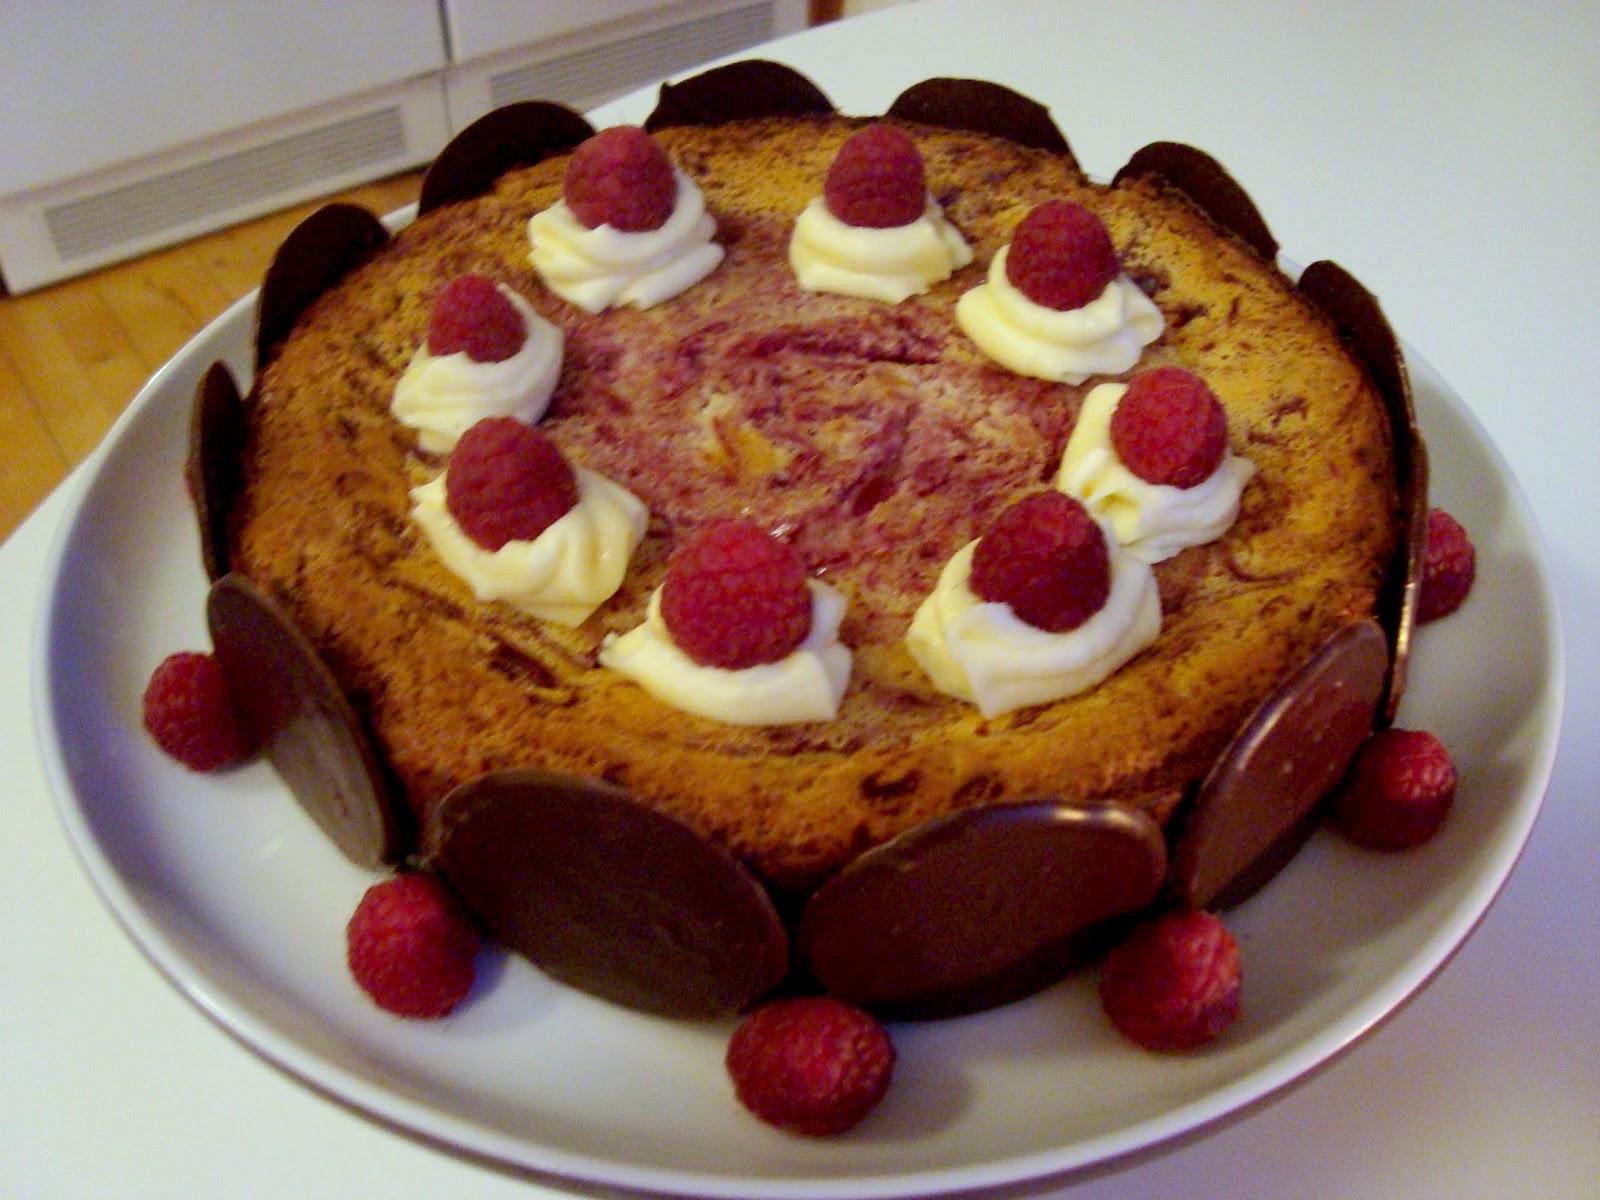 Healthier White Chocolate Raspberry Cheesecake Recipes — Dishmaps